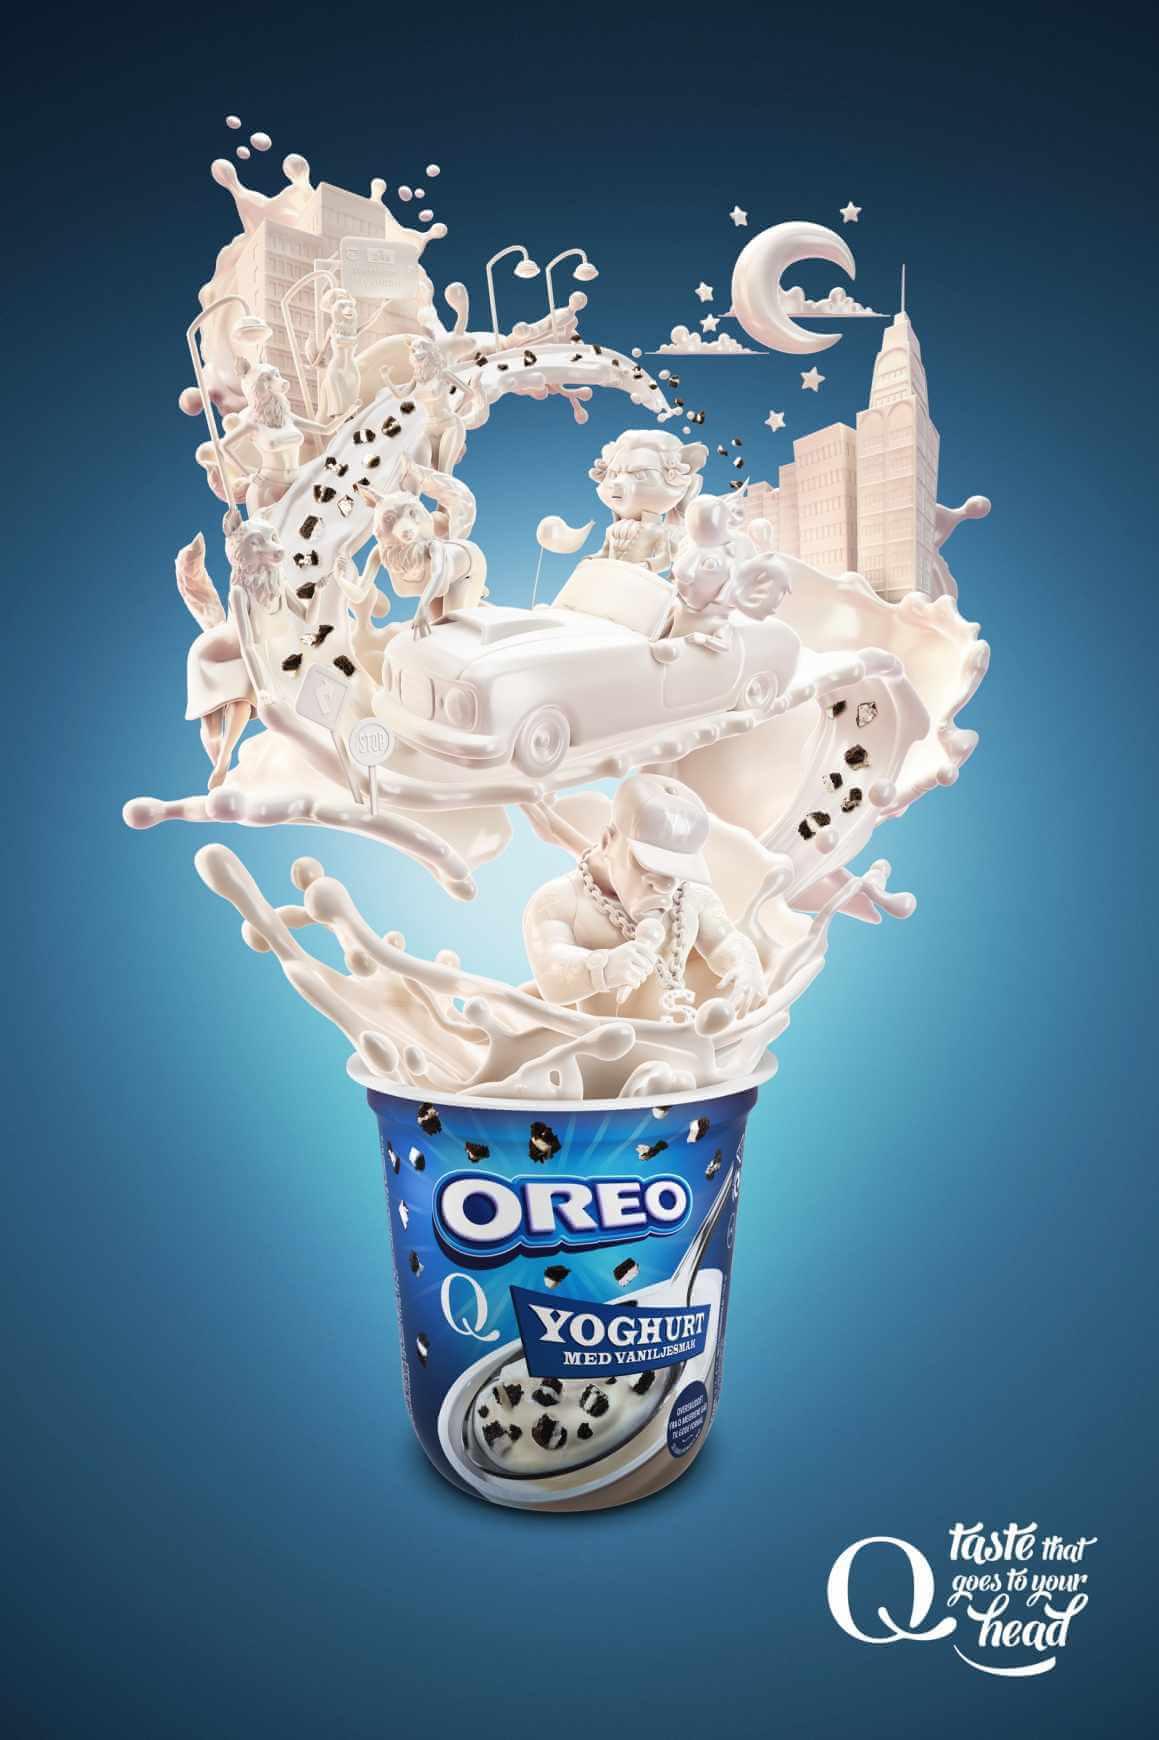 Yogurt Q-Meieriene, sabores que hacen imaginar.